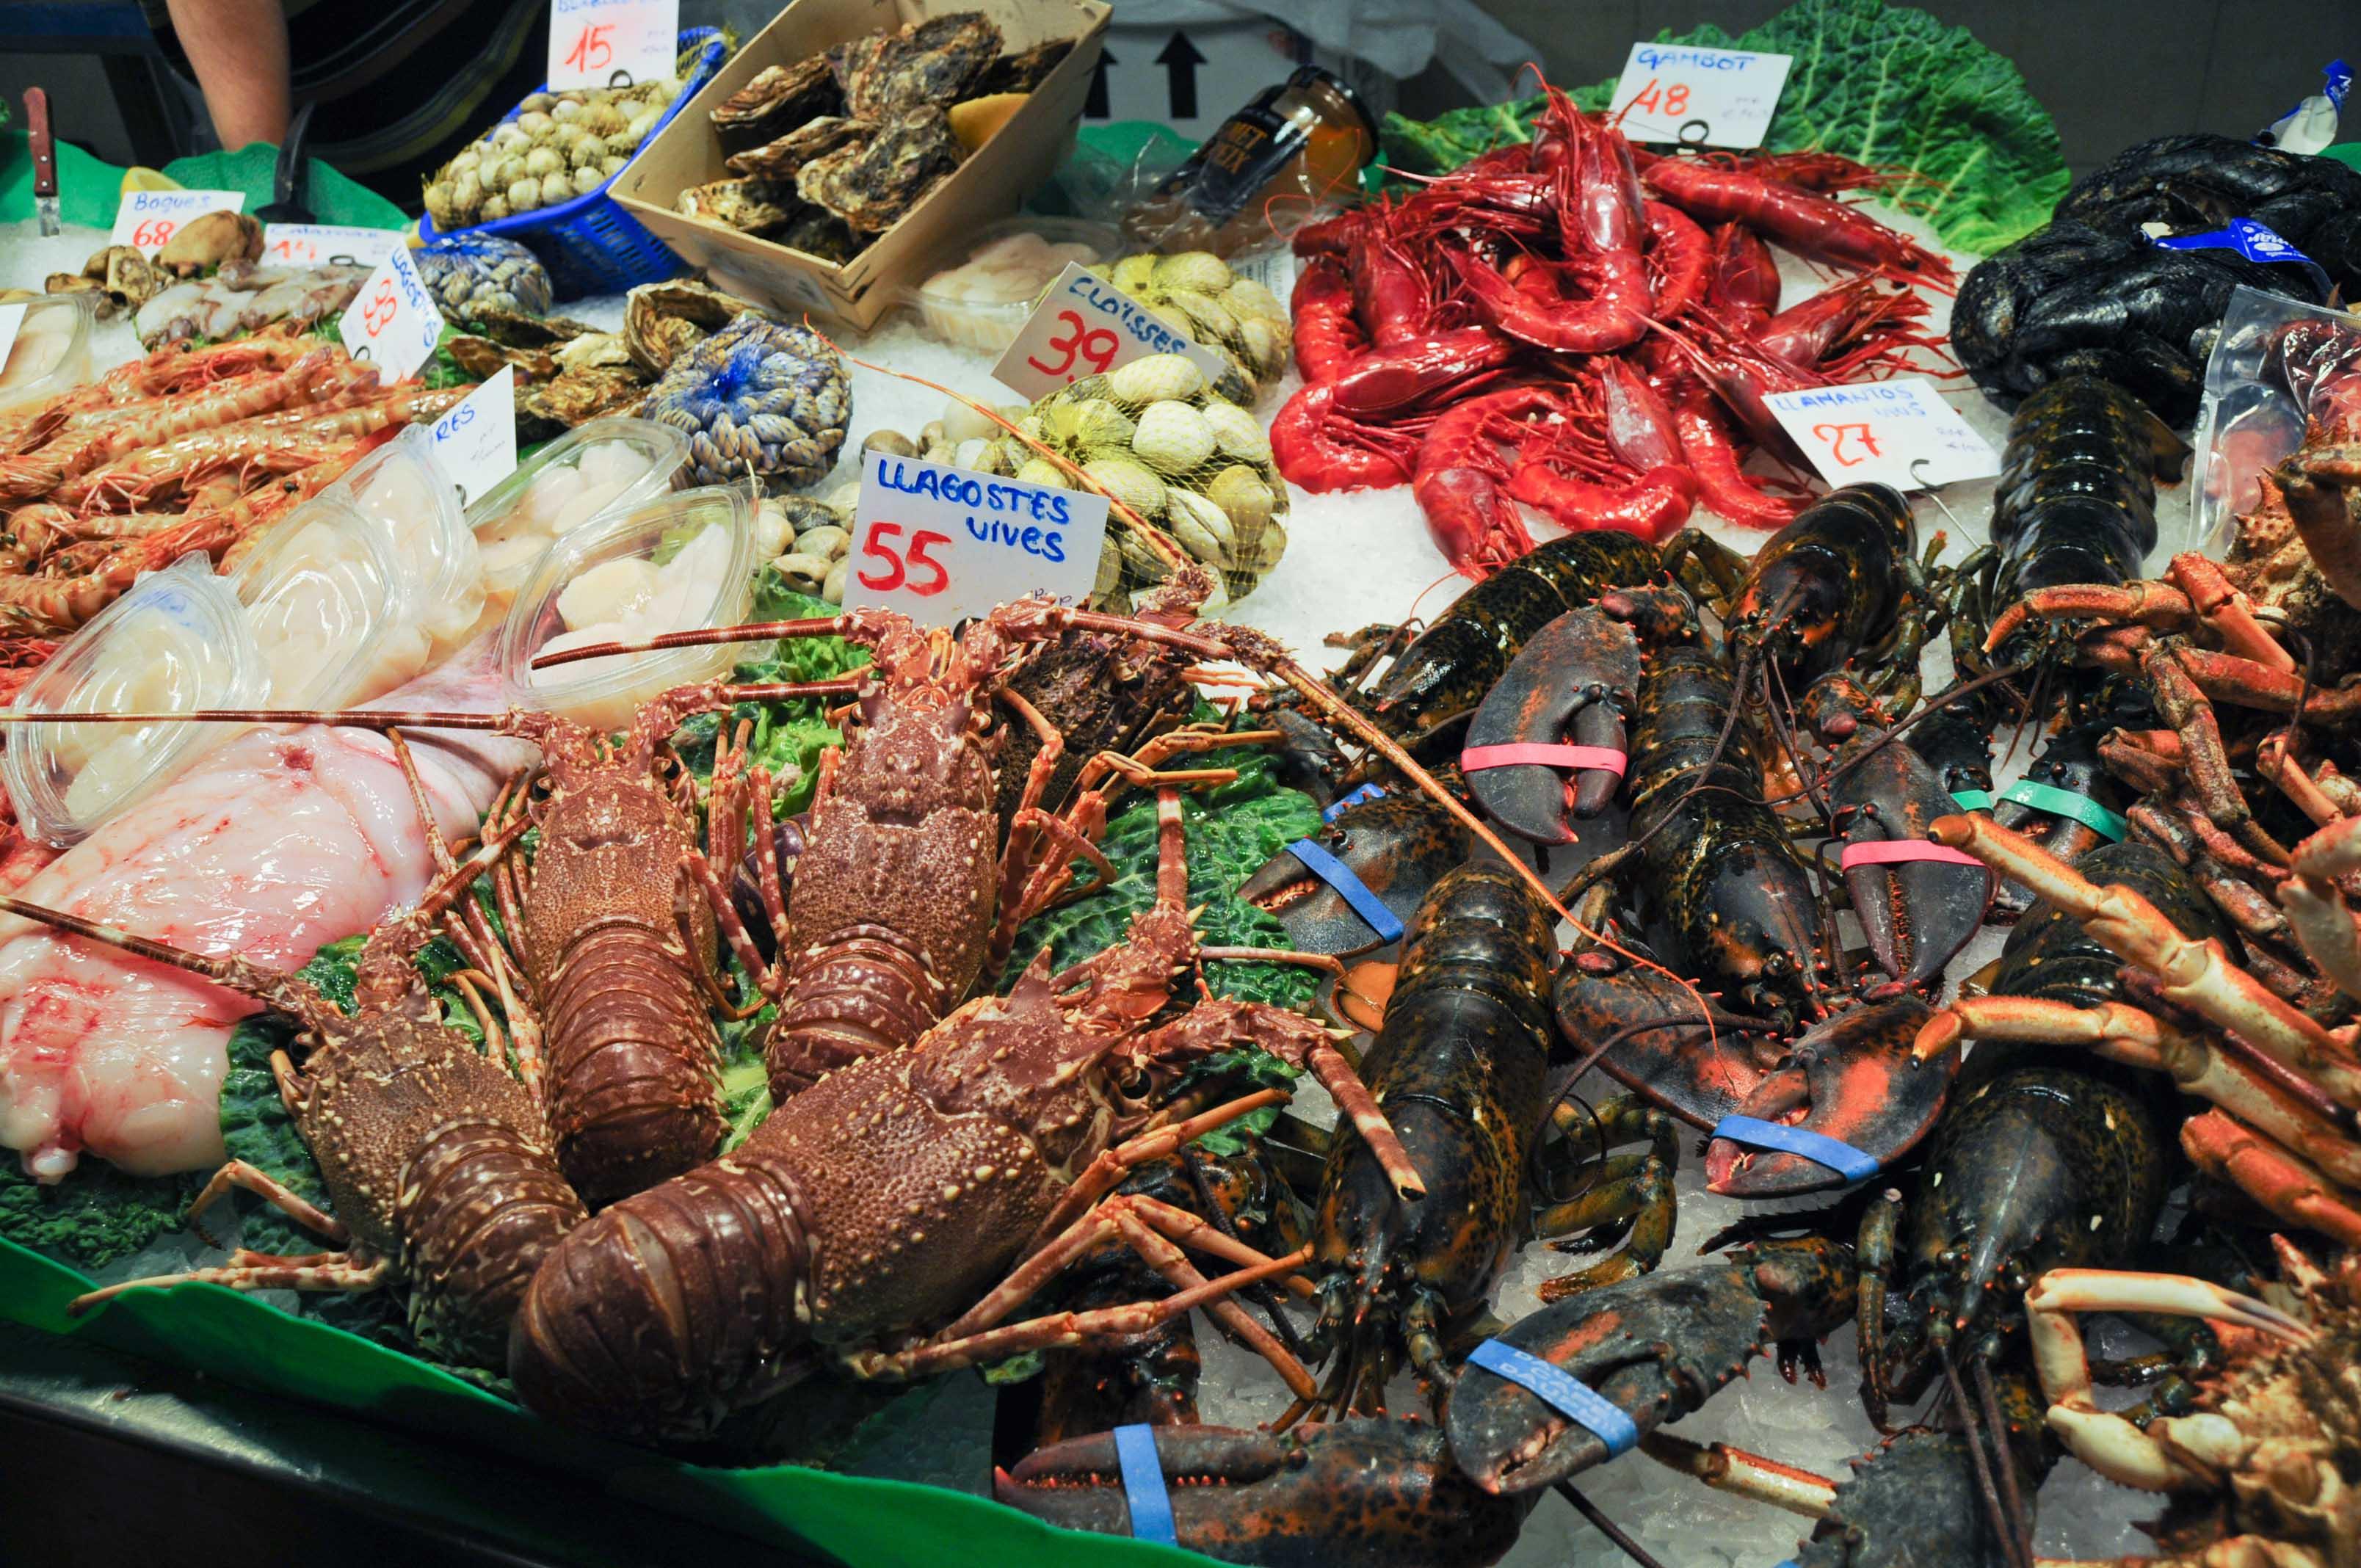 La Boqueria, l'incontournable marché de Barcelone